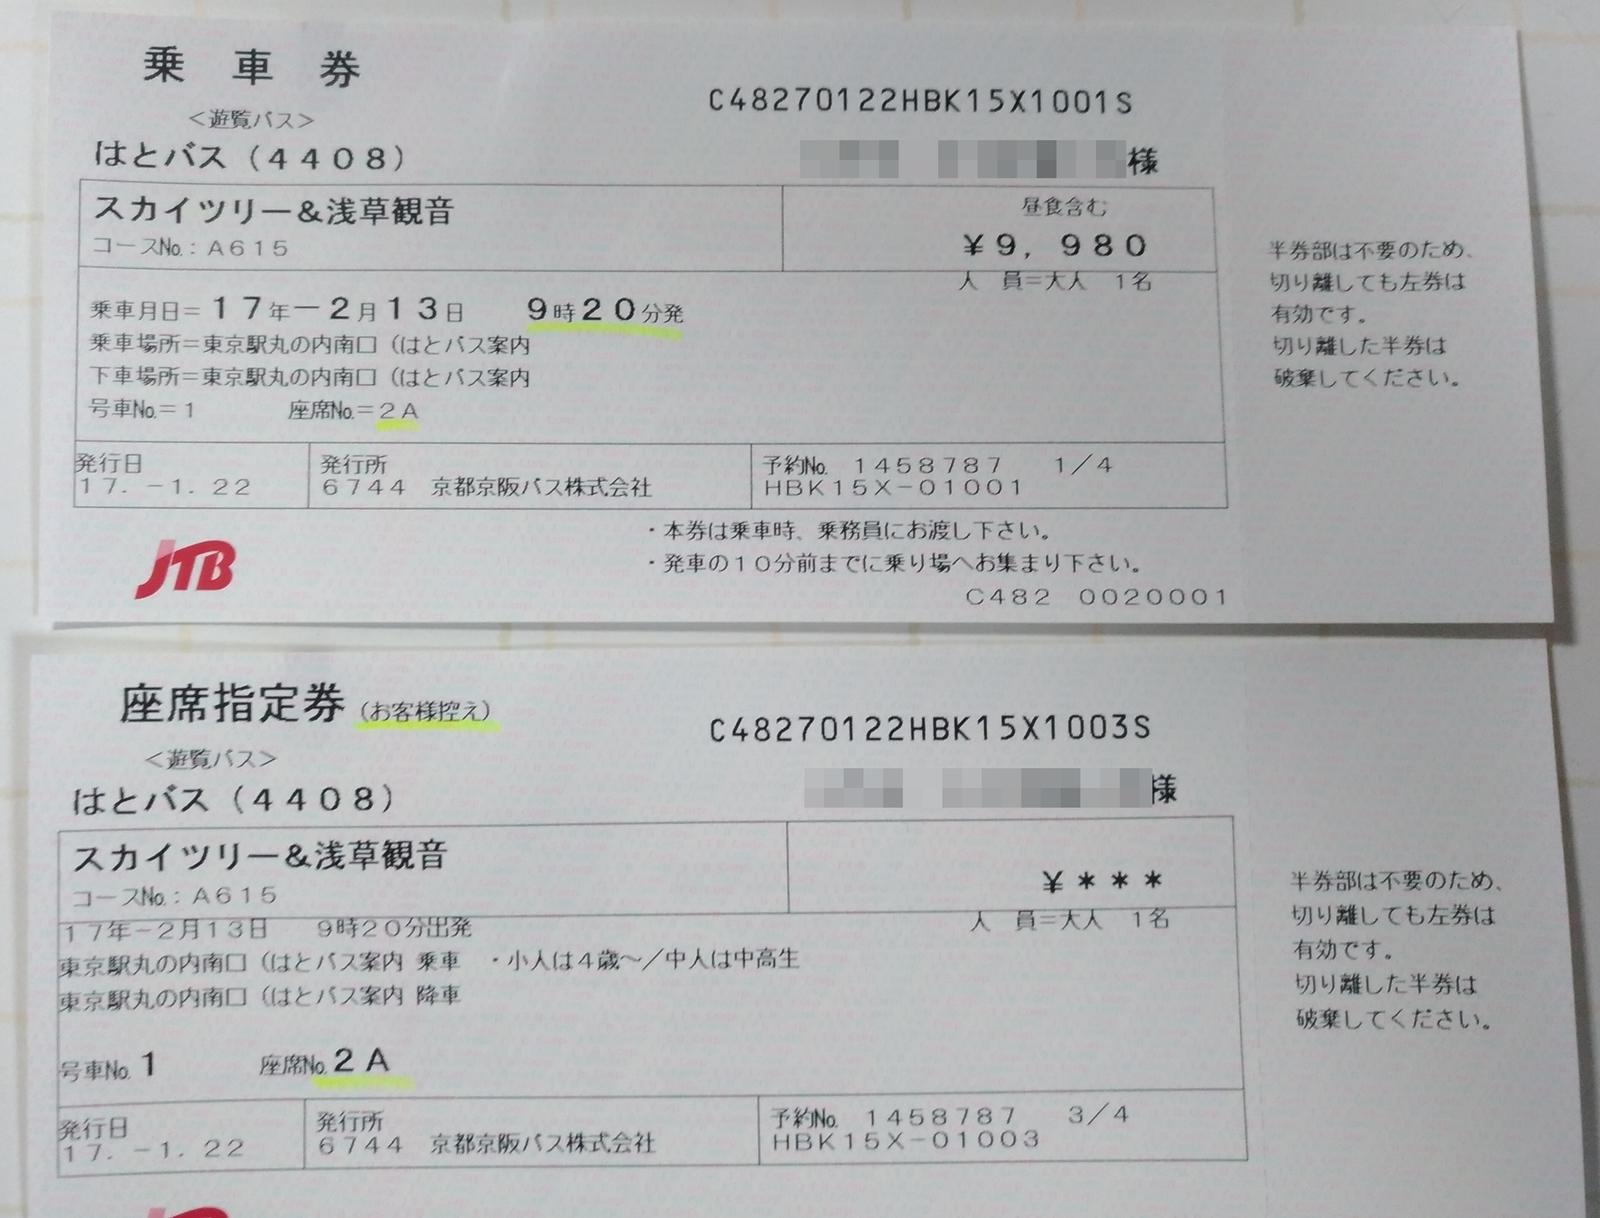 P_20170128_211259_Hato.jpg